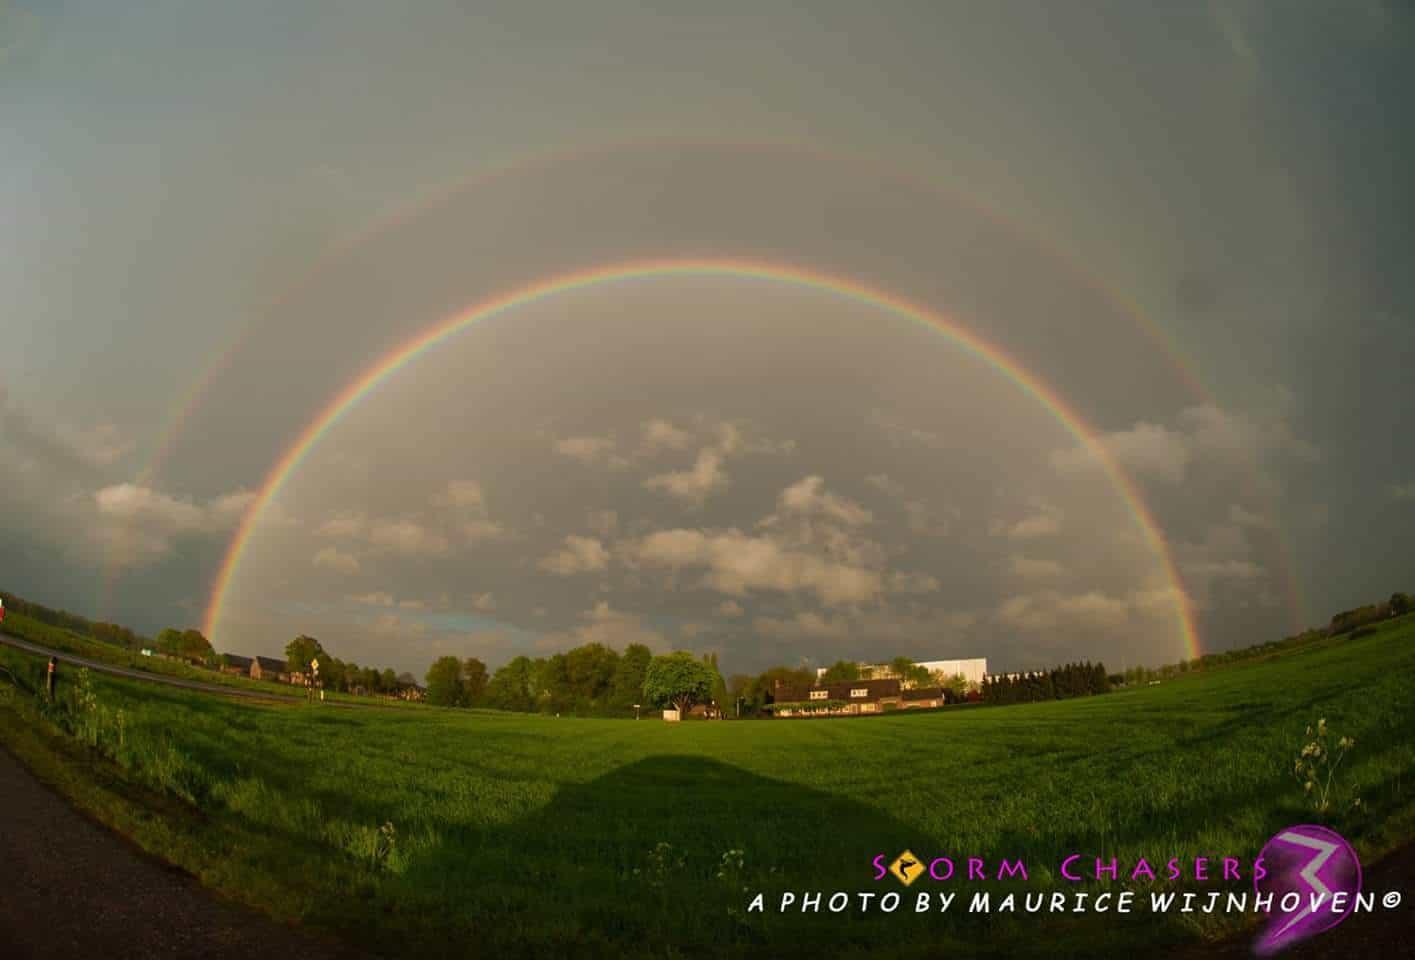 One year ago in Wanssum, North Limburg, Netherlands